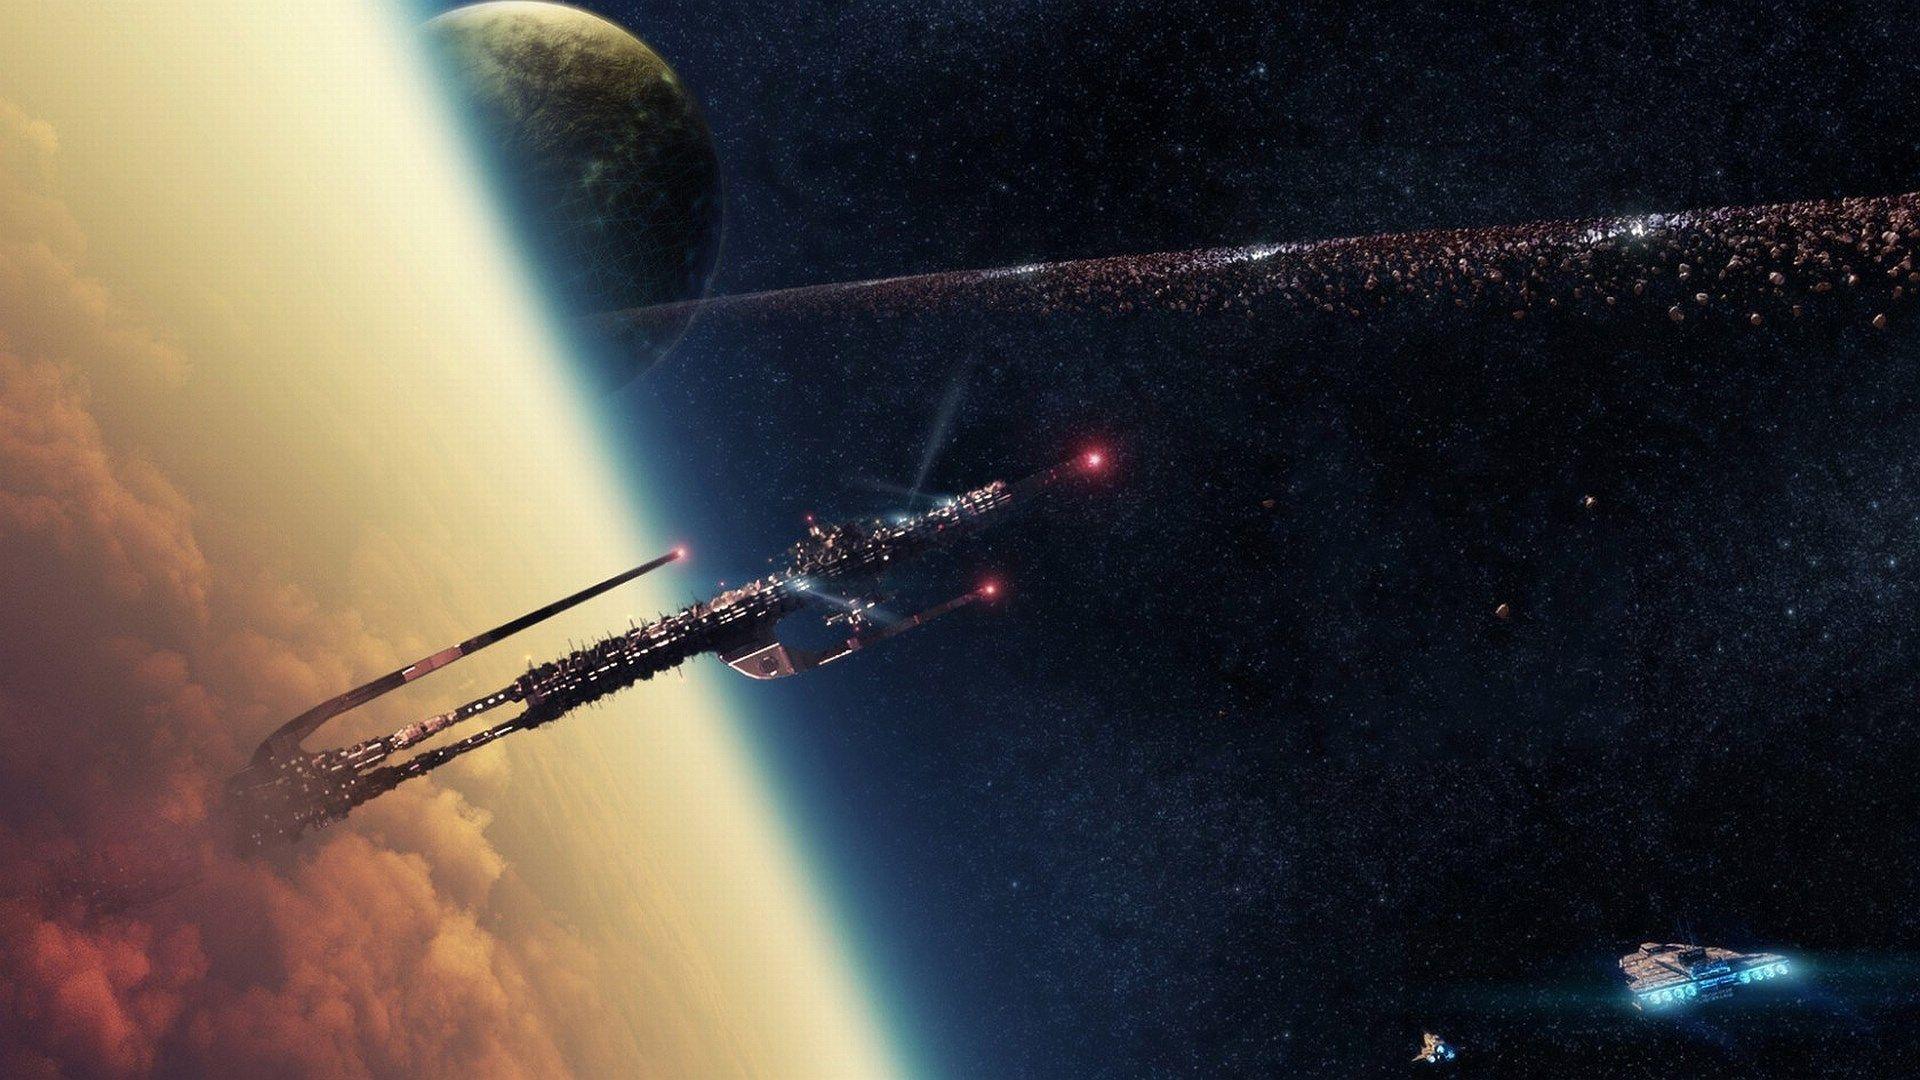 1920x1080 high resolution wallpaper spaceship space